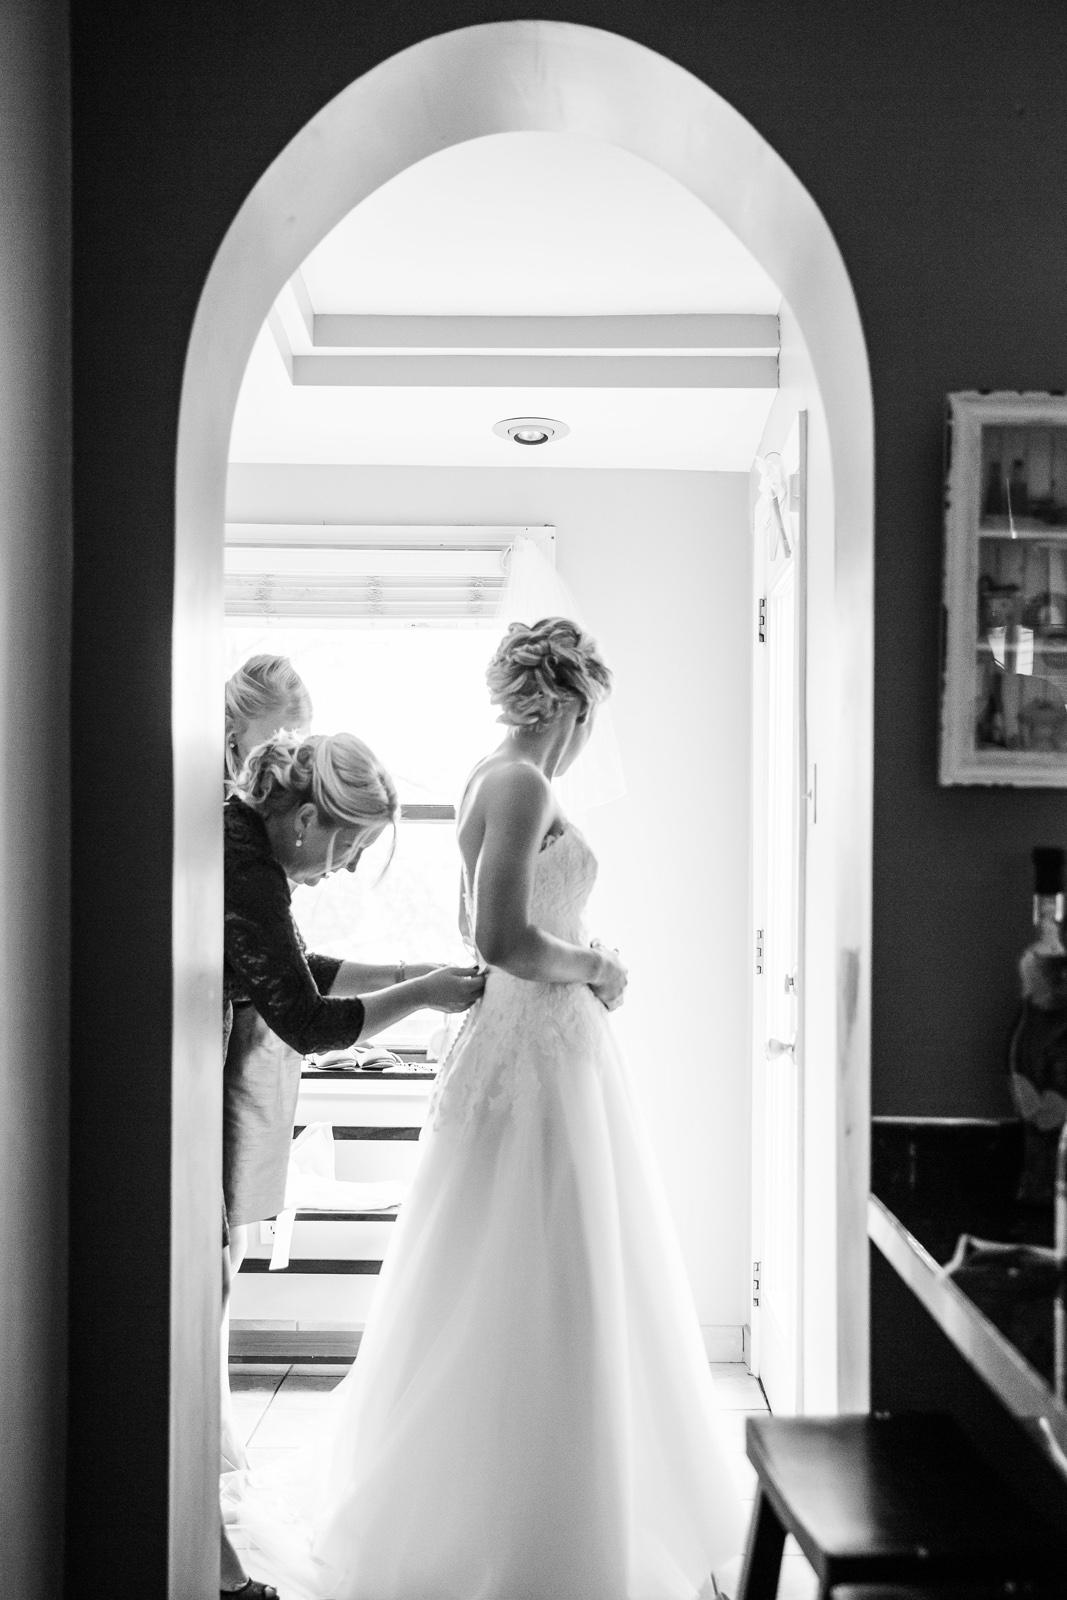 St Louis Winter Wedding Photography_20141115_14021135.jpg